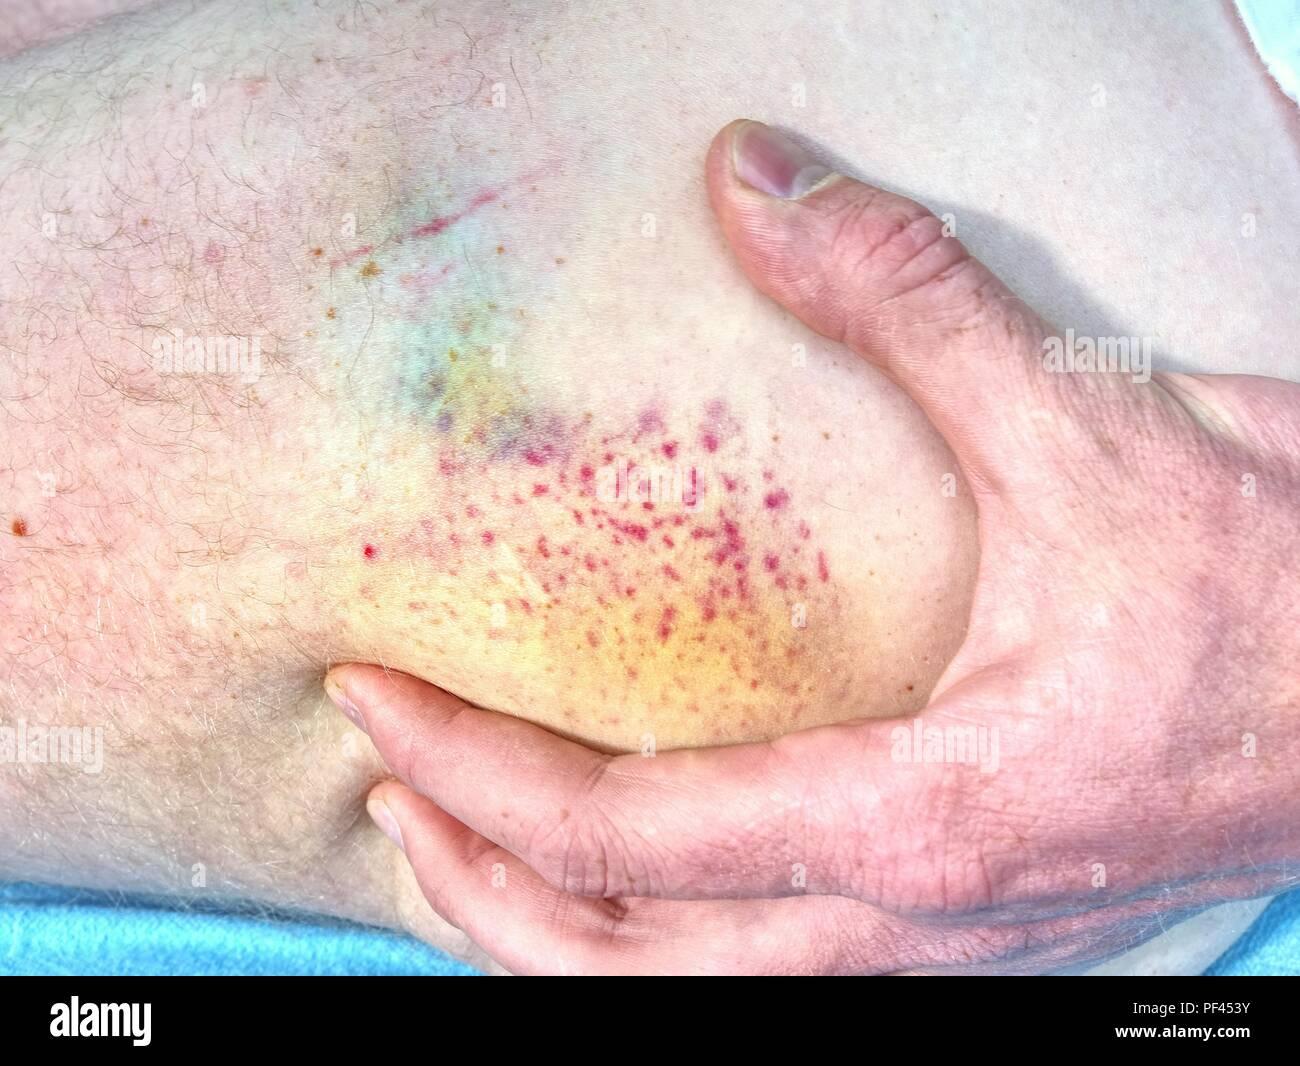 Blotchy Skin Stock Photos & Blotchy Skin Stock Images - Alamy